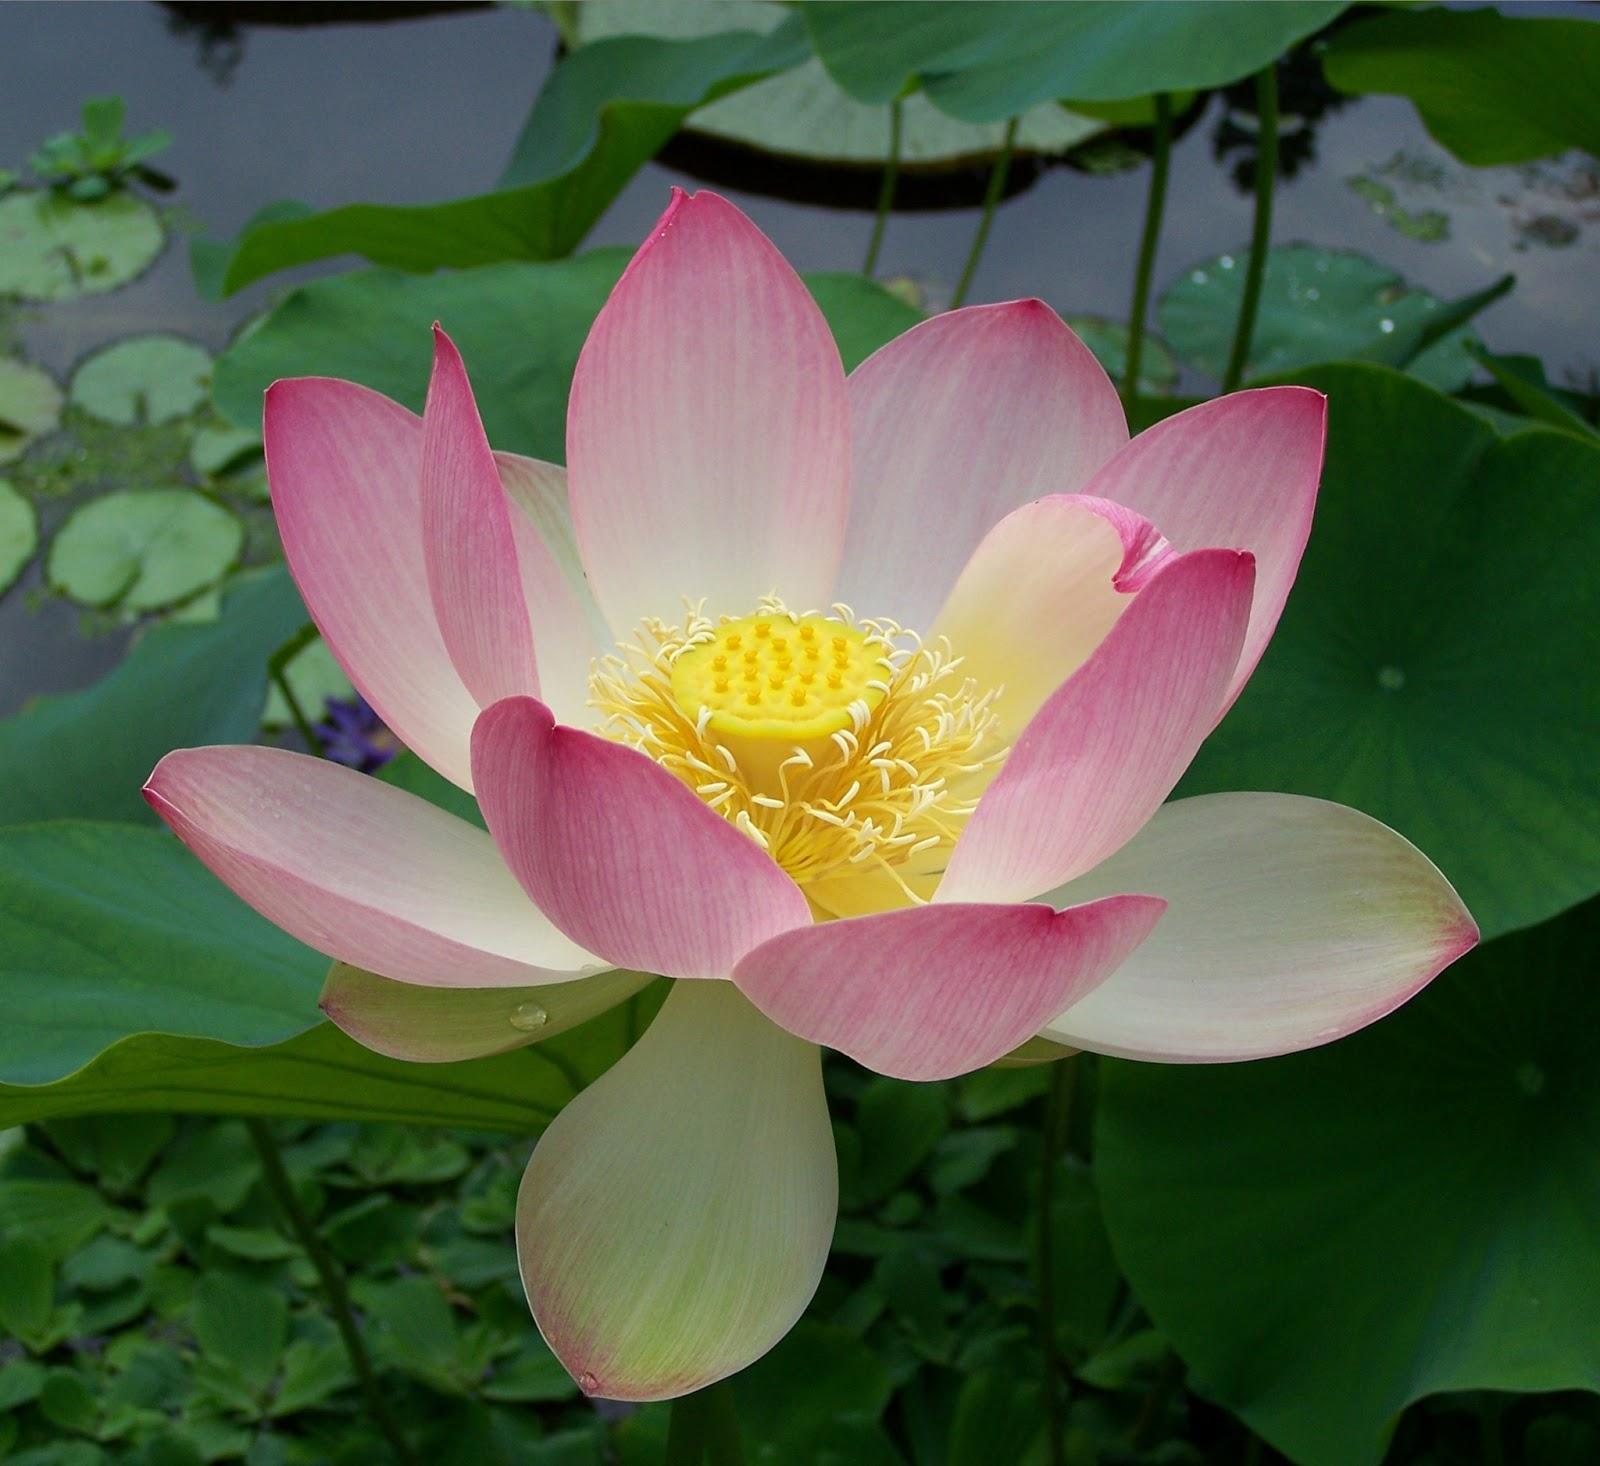 Letters to a nichiren buddhist chanting nam myoho renge kyo download mp3 of gongyo and diamoku mightylinksfo